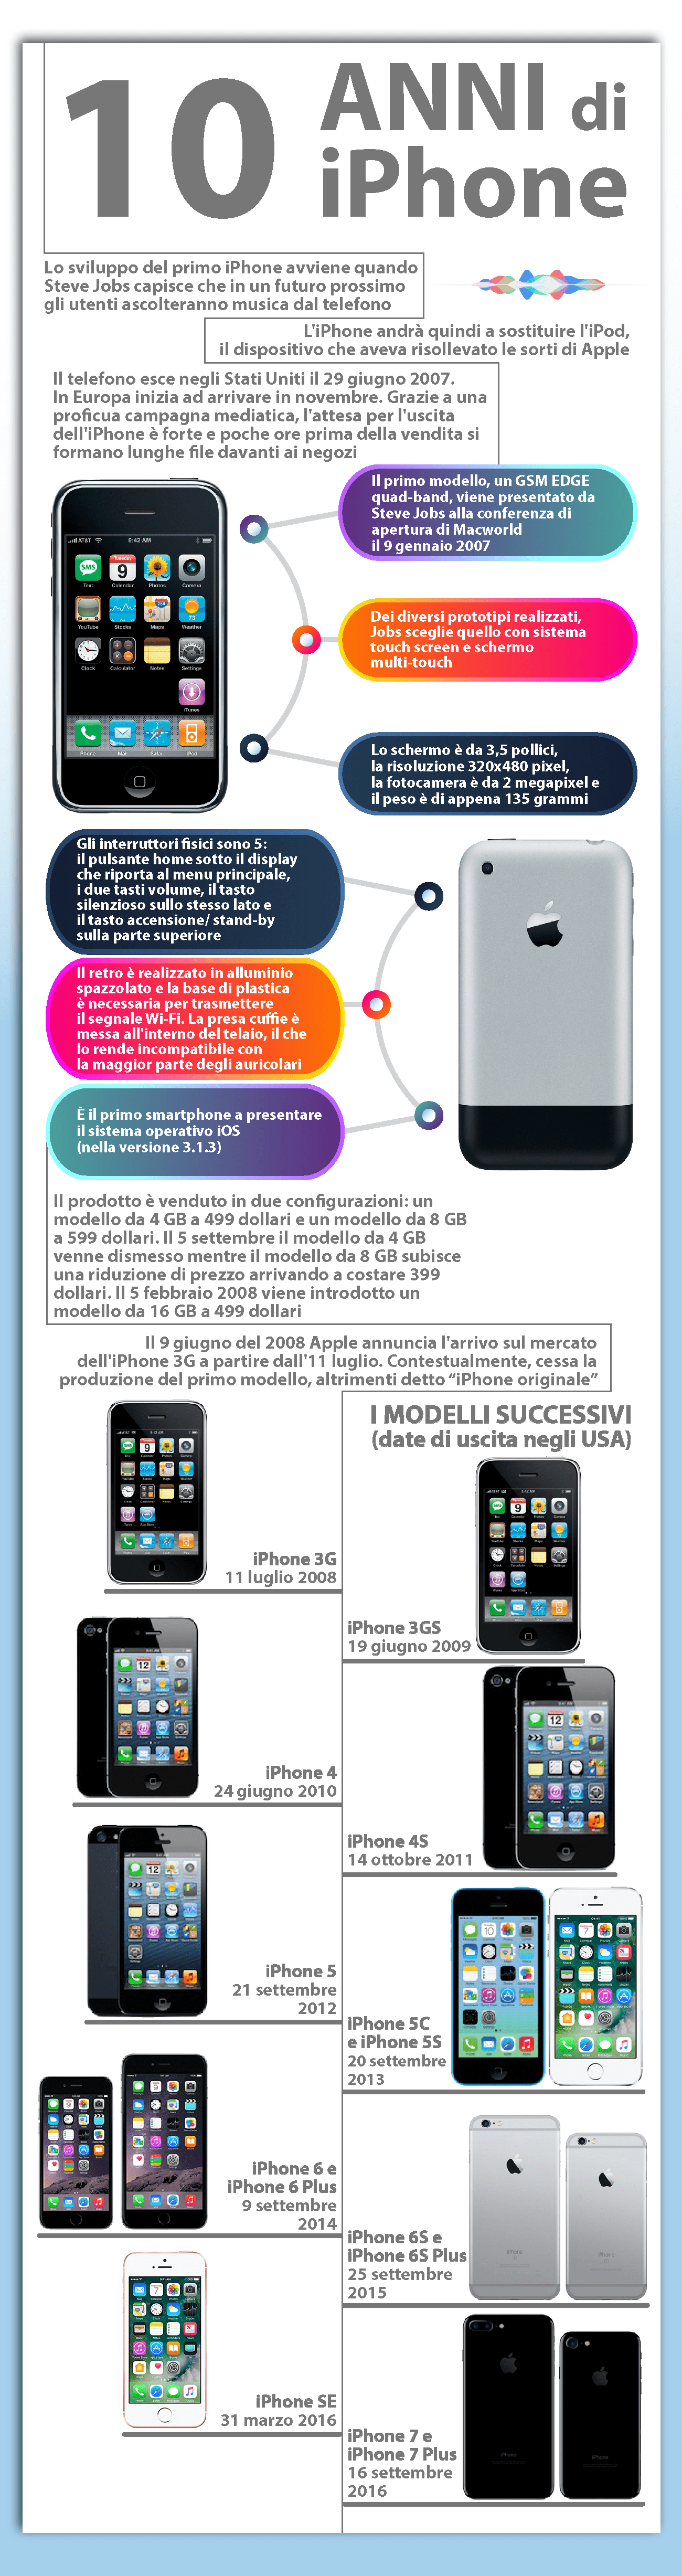 Infografica storia iPhone